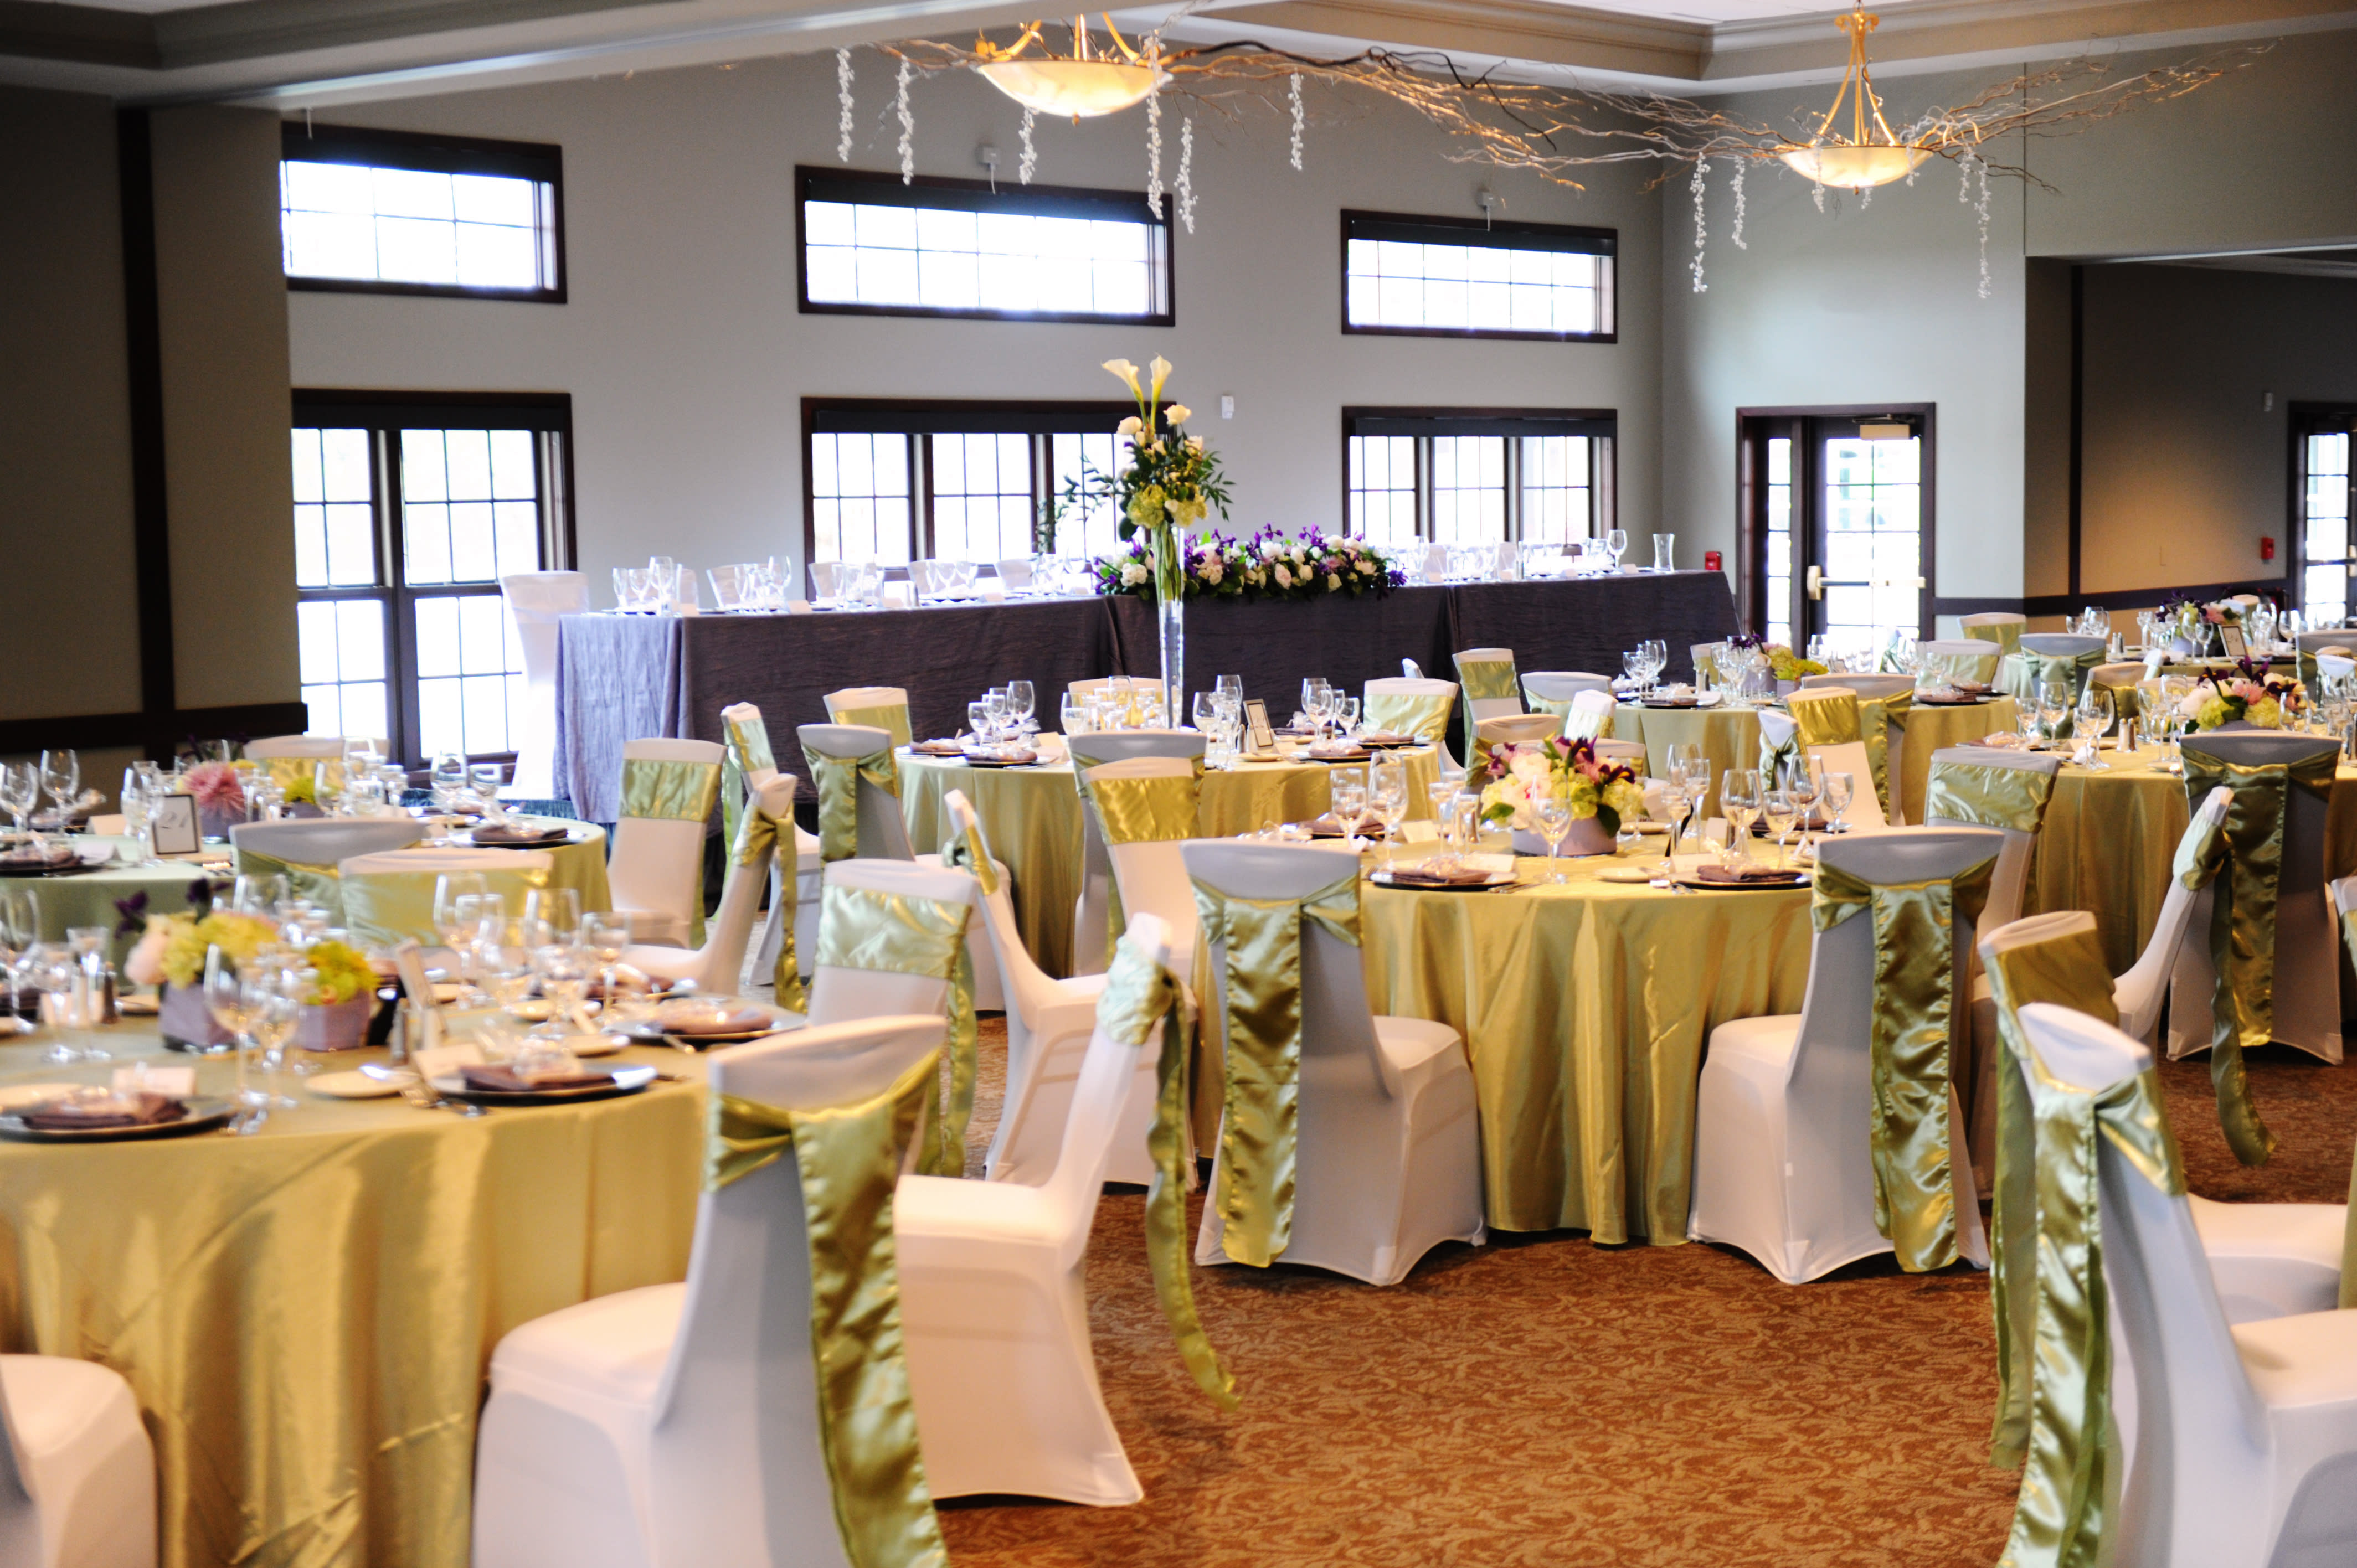 Thousand Oaks Meeting Facilities In Grand Rapids Mi